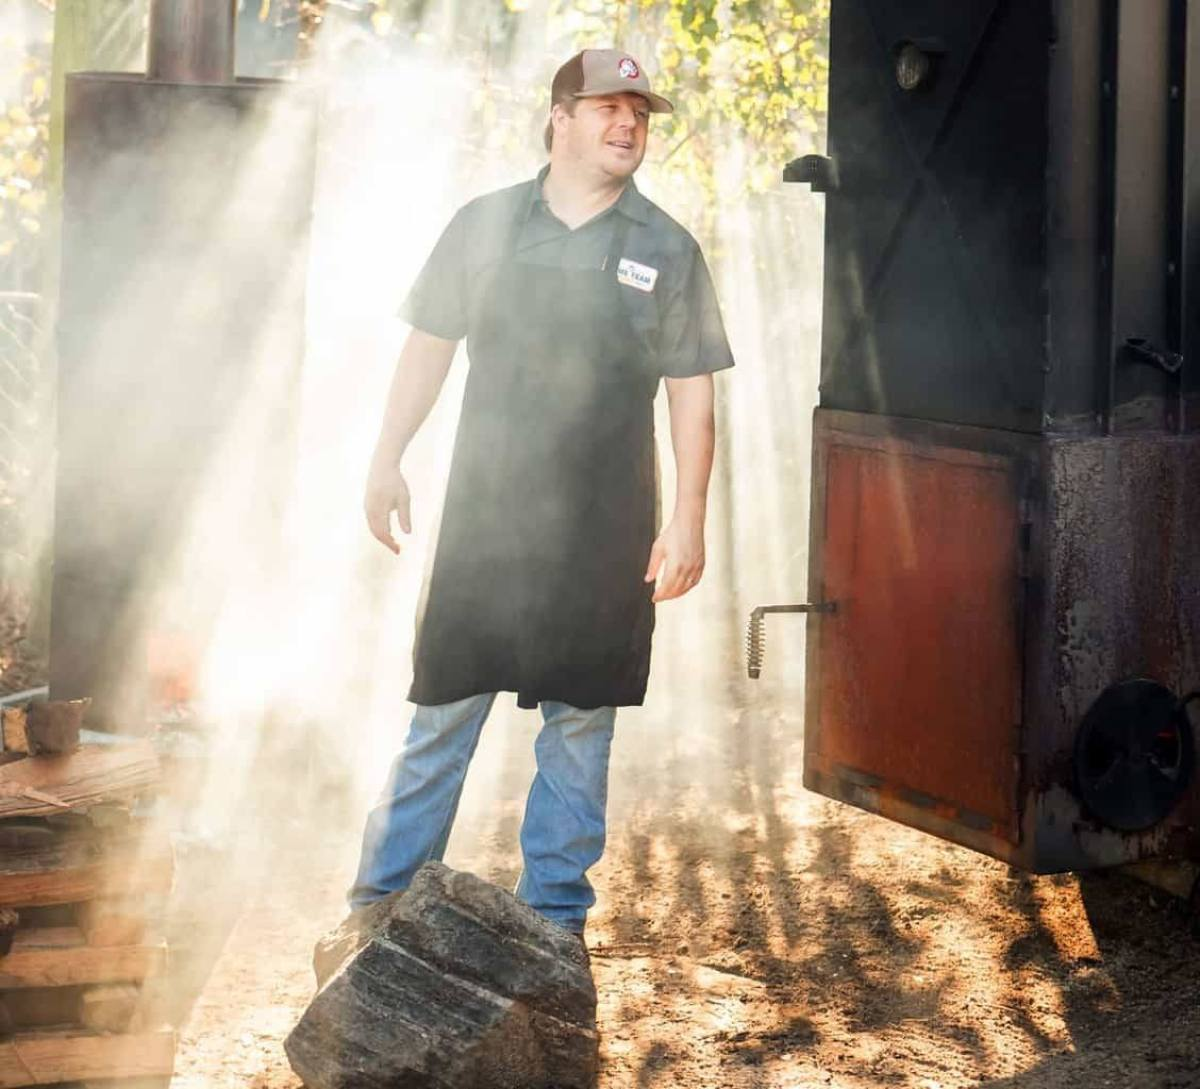 Aaron Siegel: Where there's smoke...